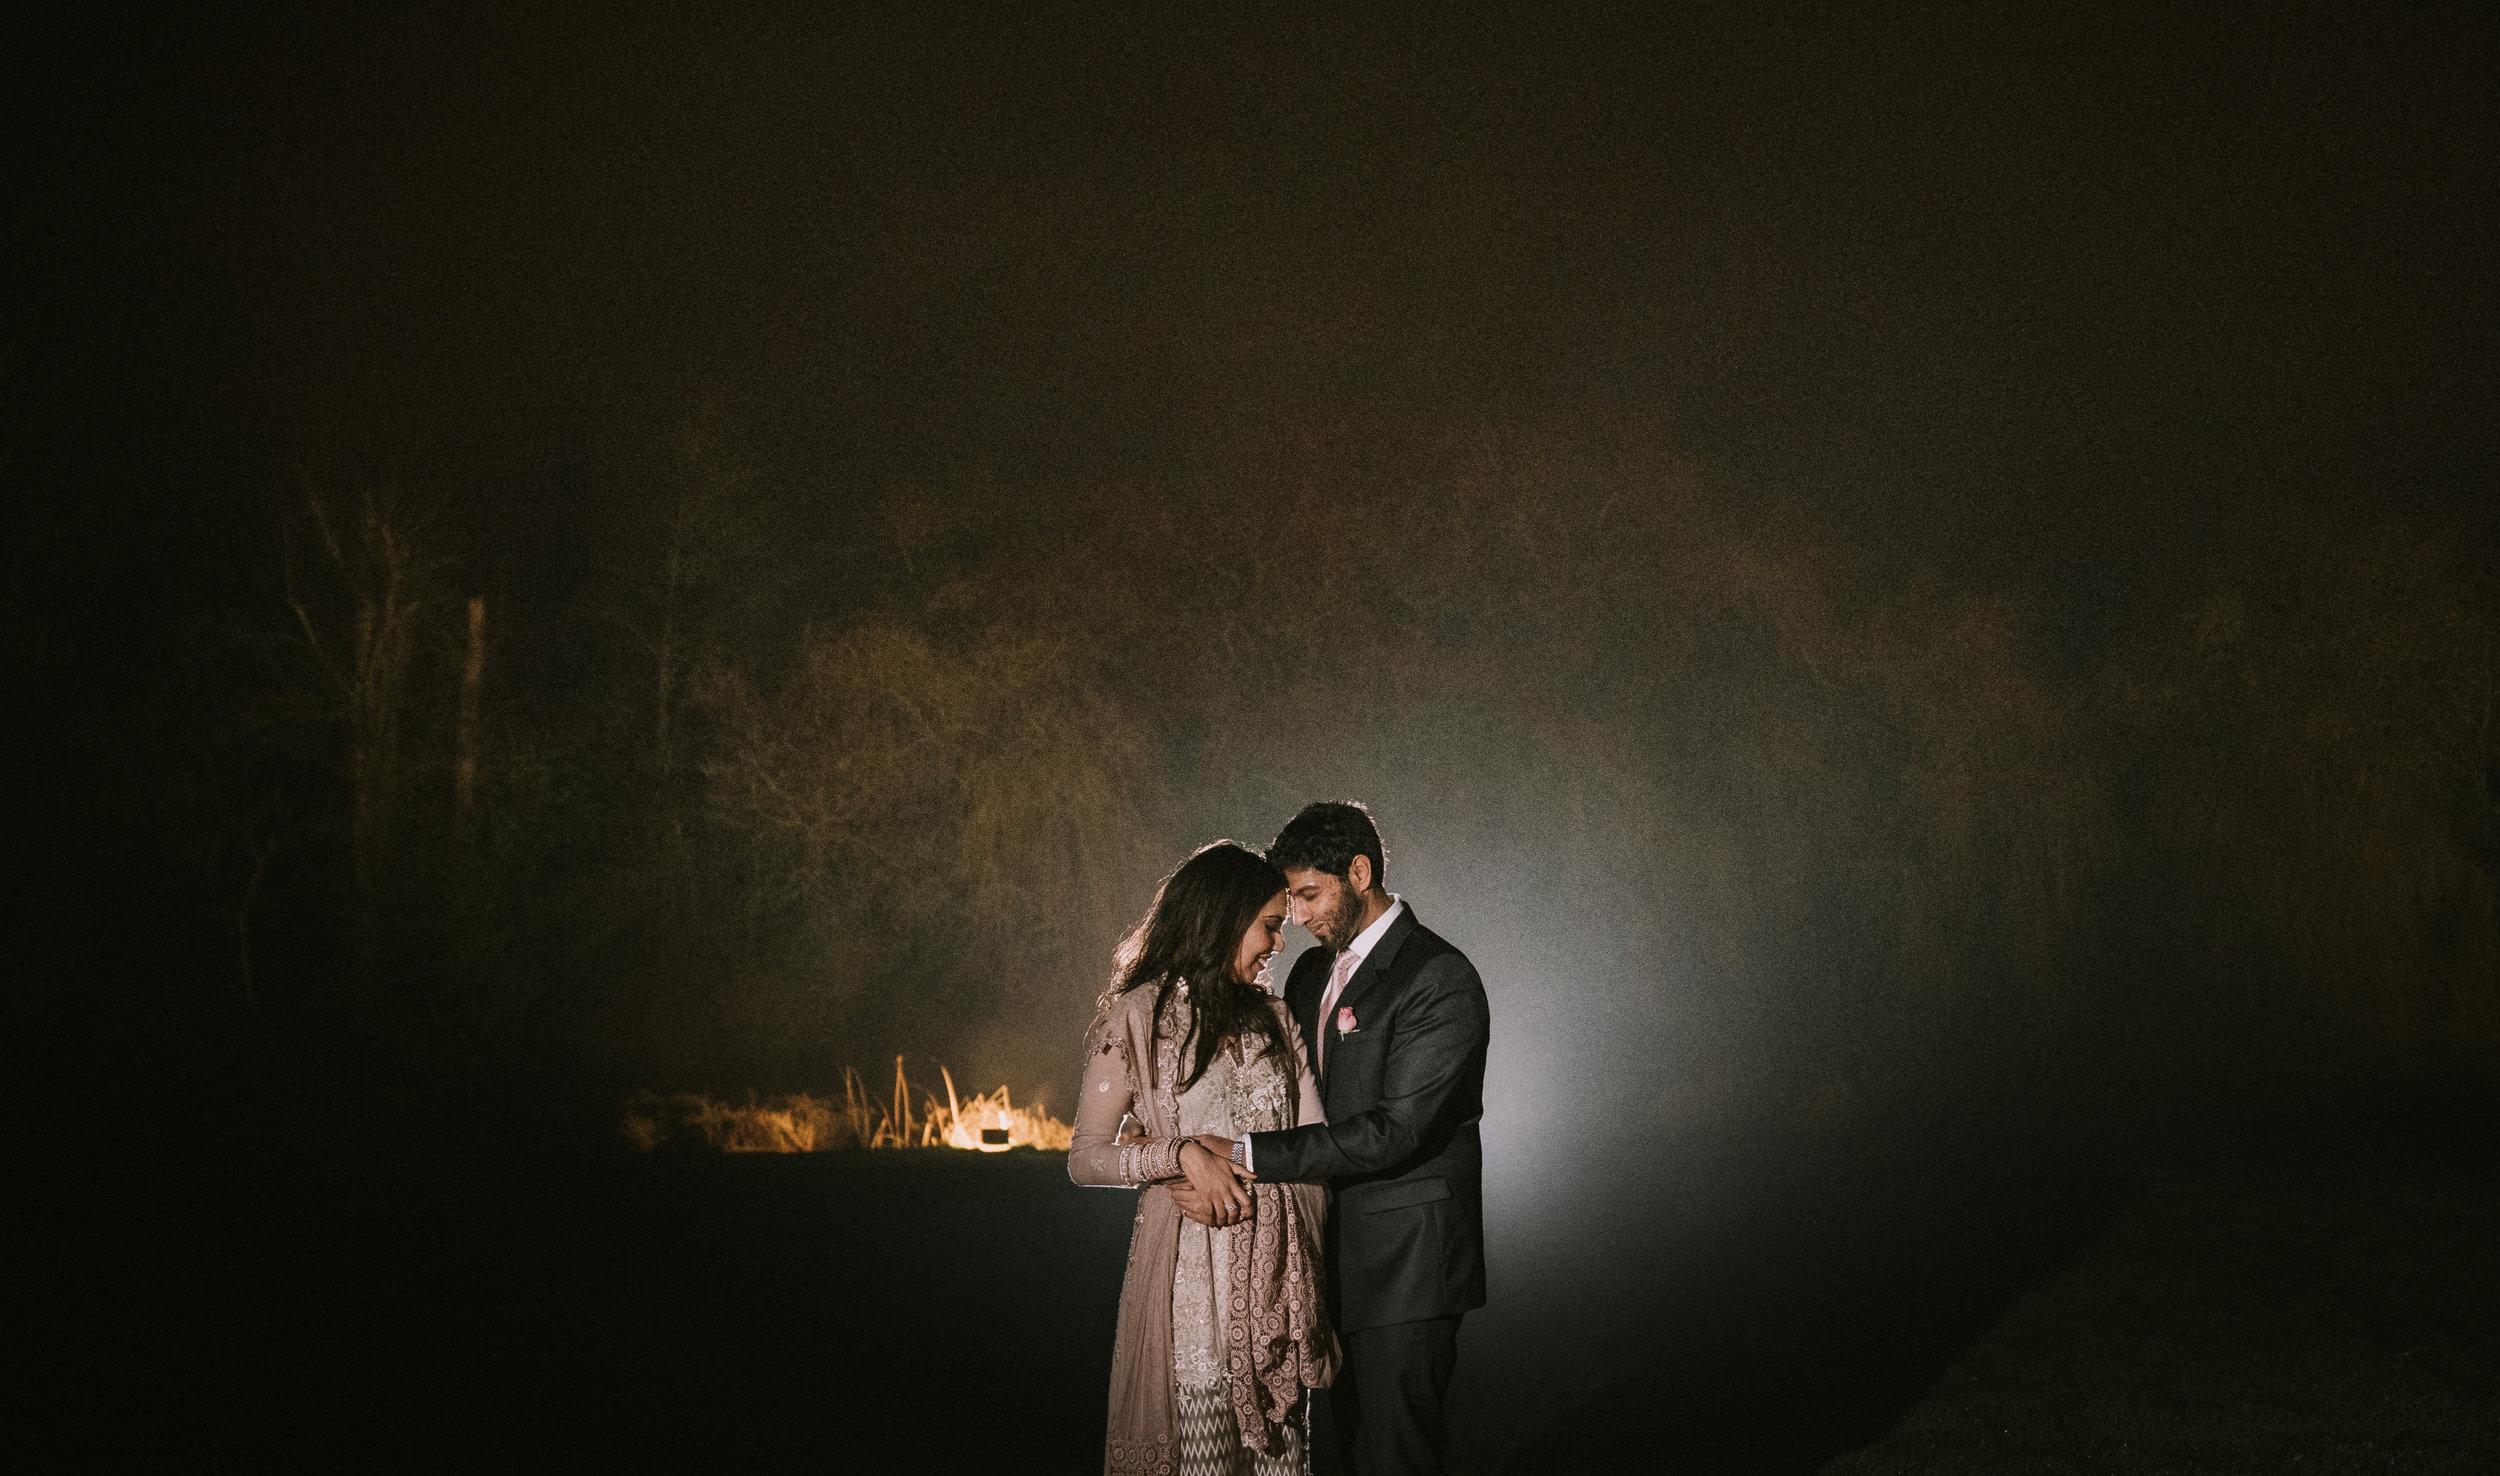 buckinghamshire-golf-club-winter-muslim-wedding-engagement-photography-videography-71